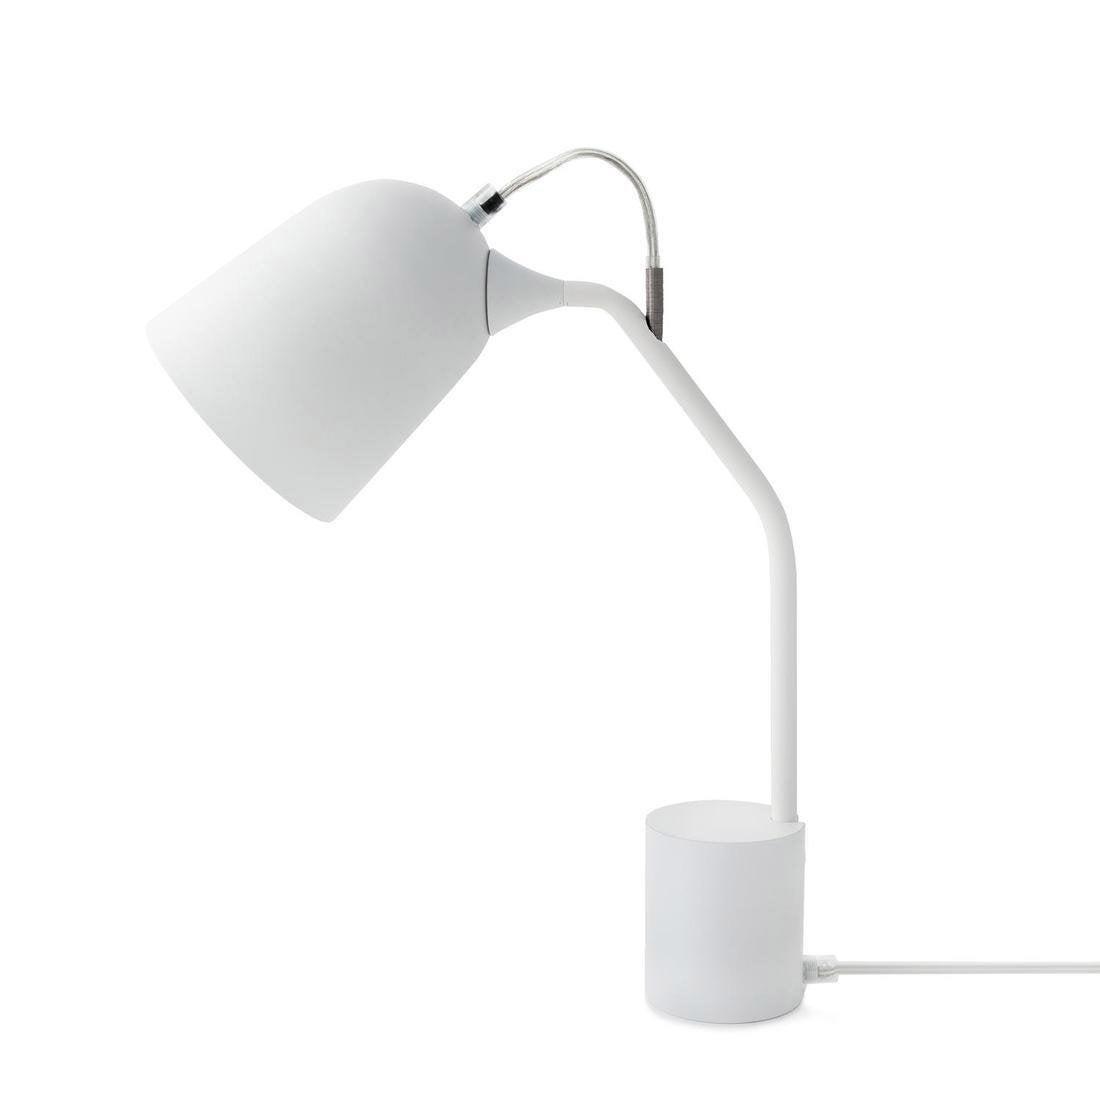 Lampe, design, plastique blanc, LO EDITIONS Magnétic orientable